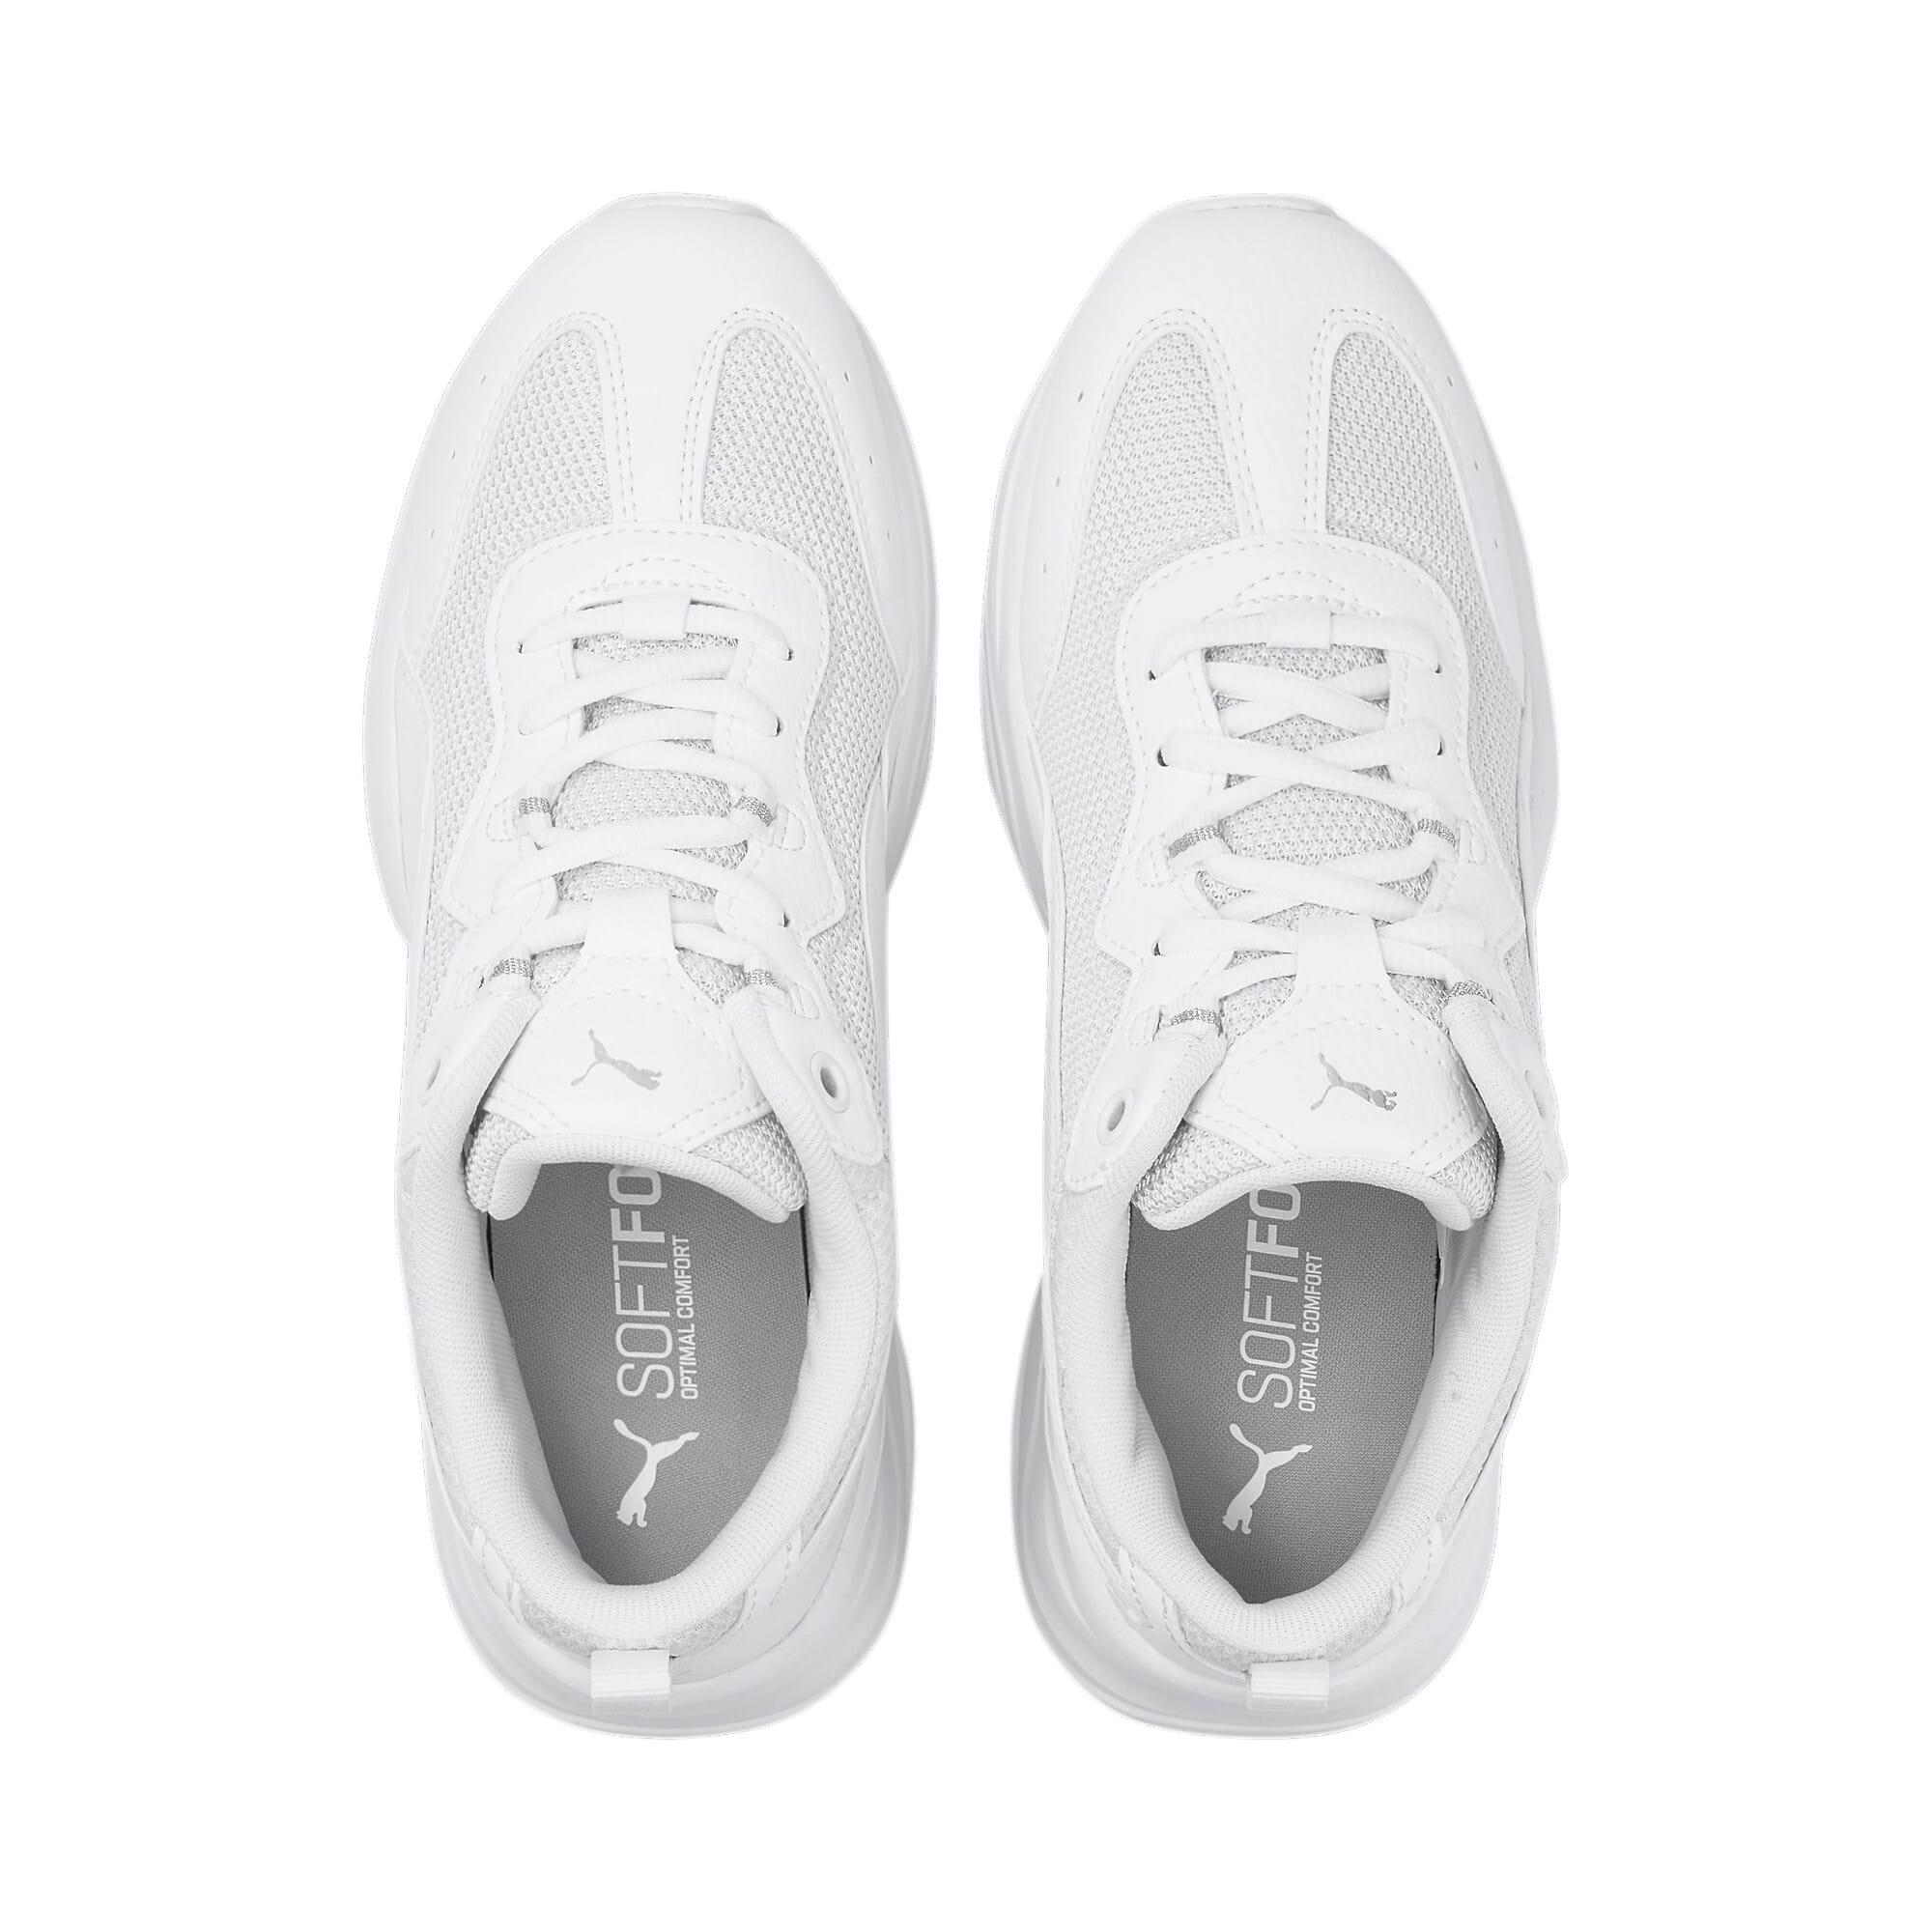 Thumbnail 6 of Cilia Women's Sneakers, White-Gray Violet-Silver, medium